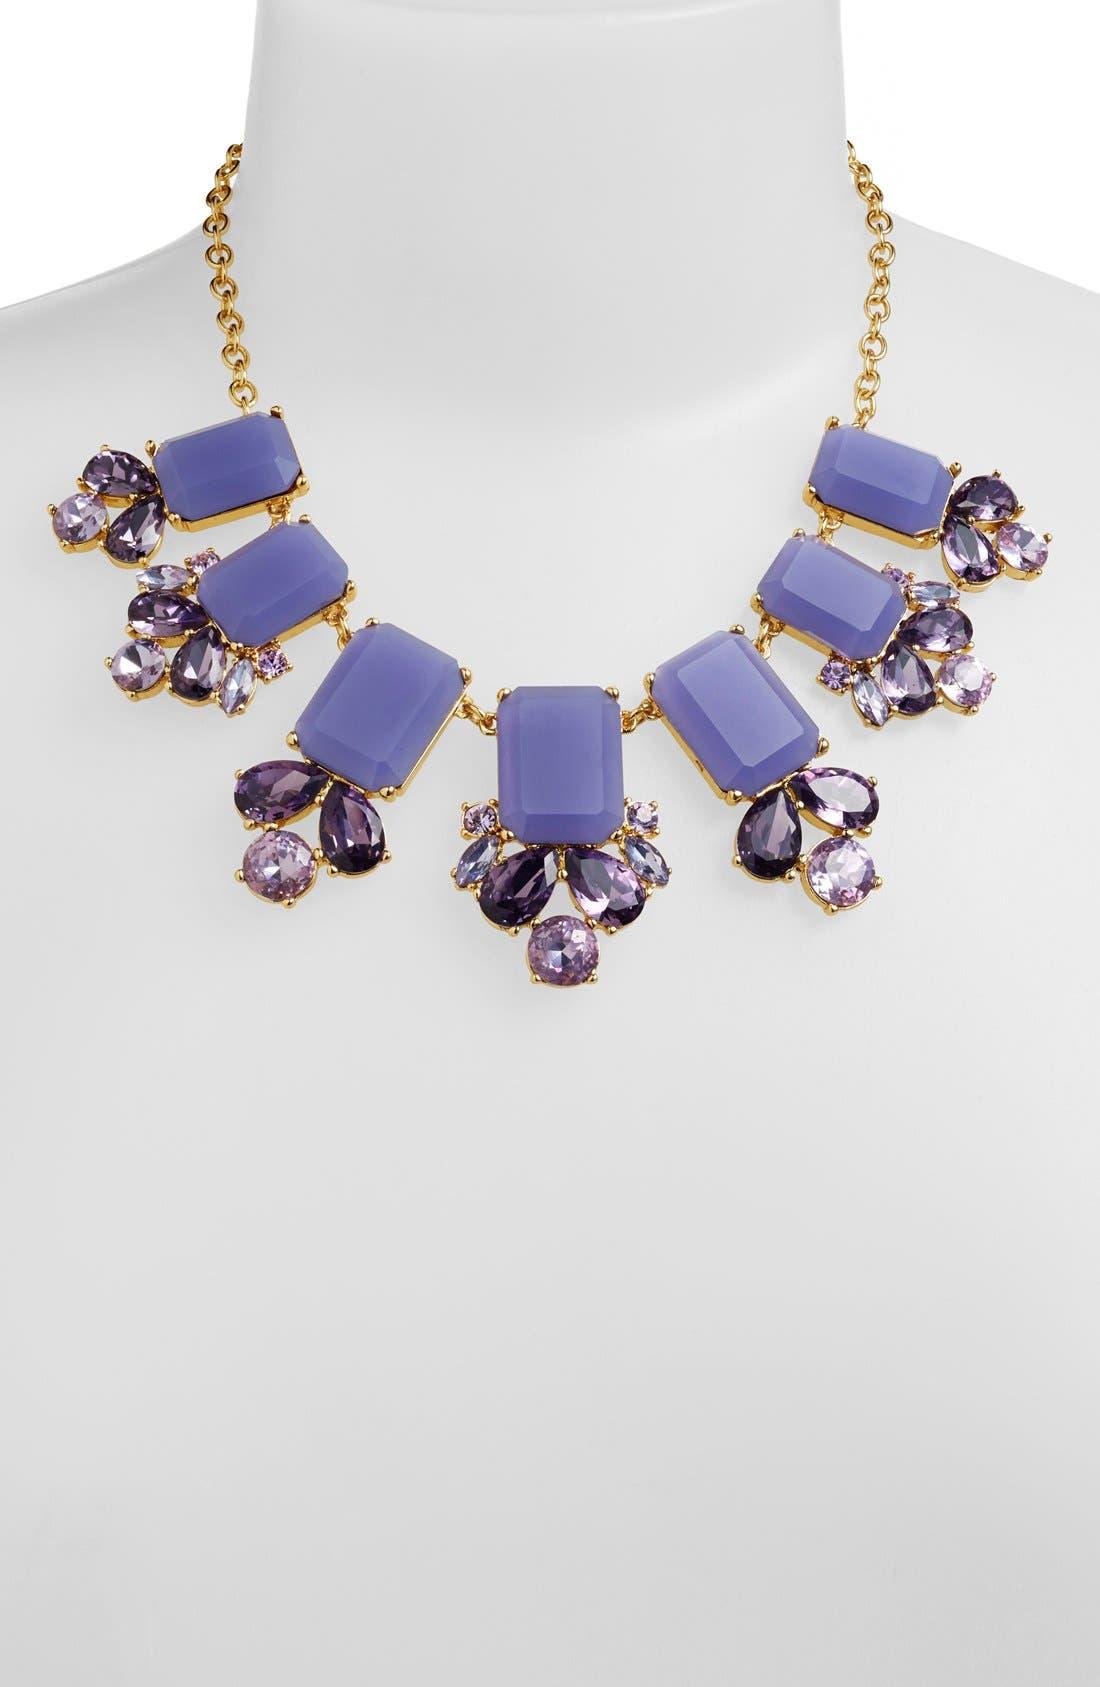 KATE SPADE NEW YORK,                             'glitzy spritz' statement necklace,                             Alternate thumbnail 2, color,                             500